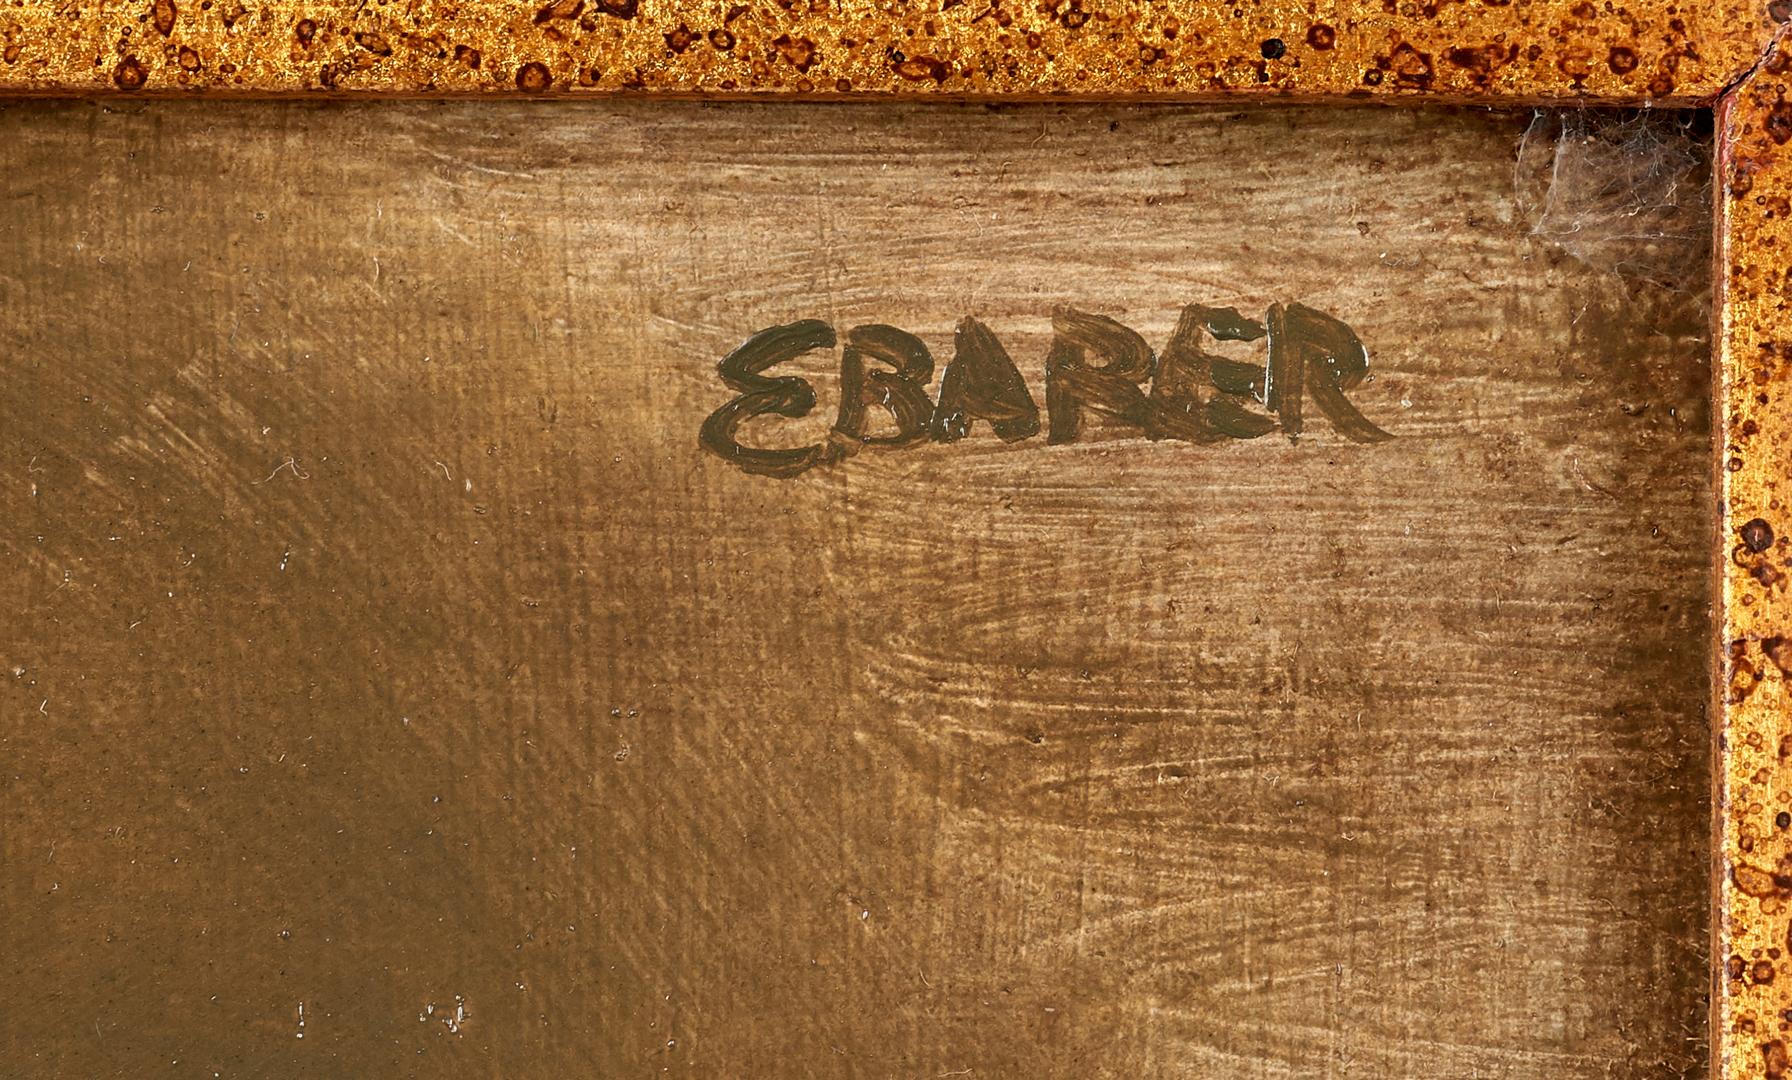 Lot 985: Ernest Baber, Small Still Life